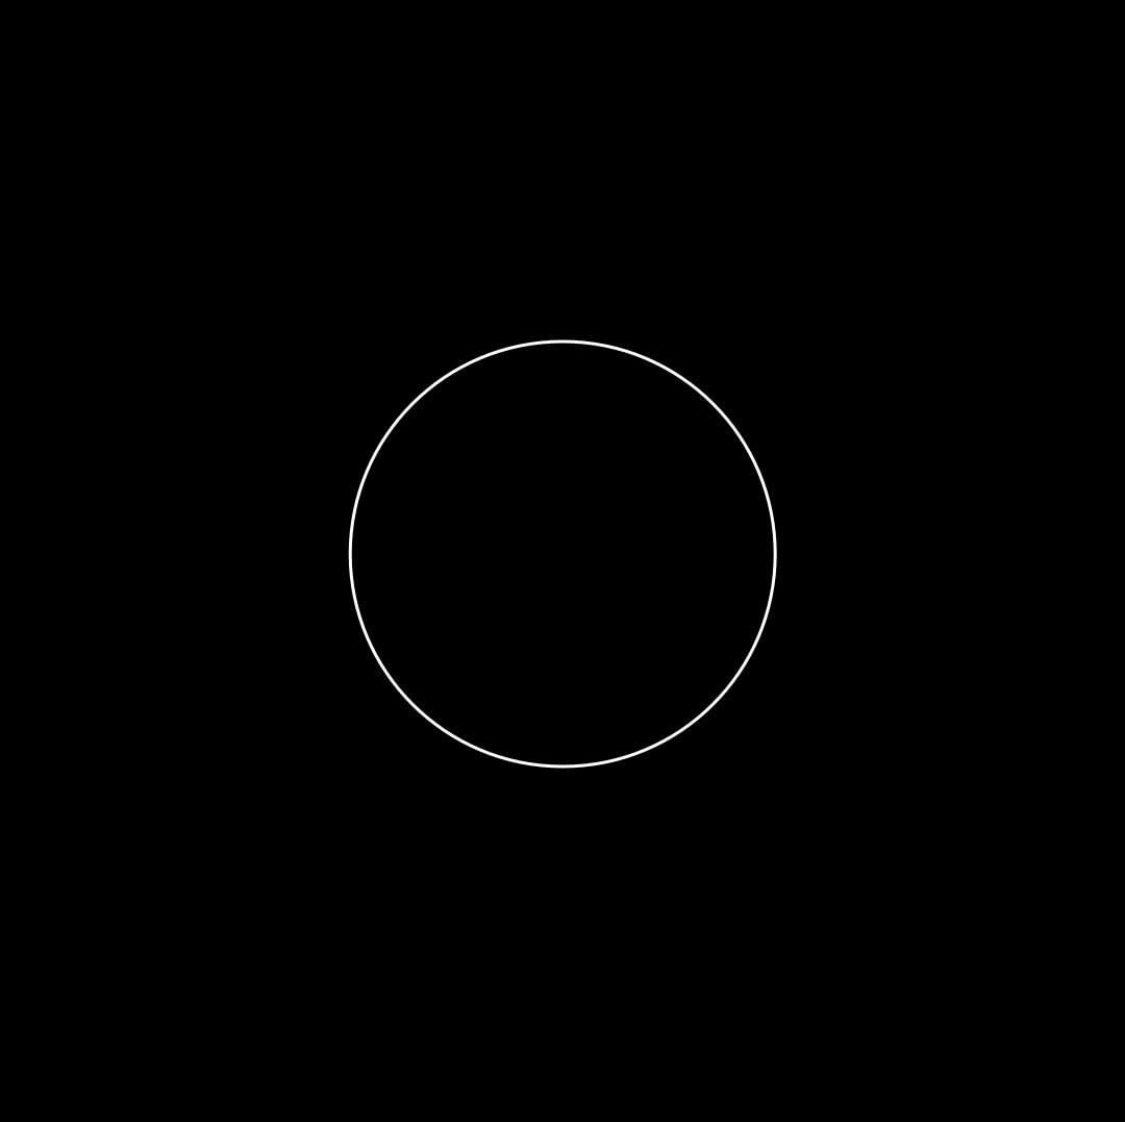 circle time gabriel garcia marquez